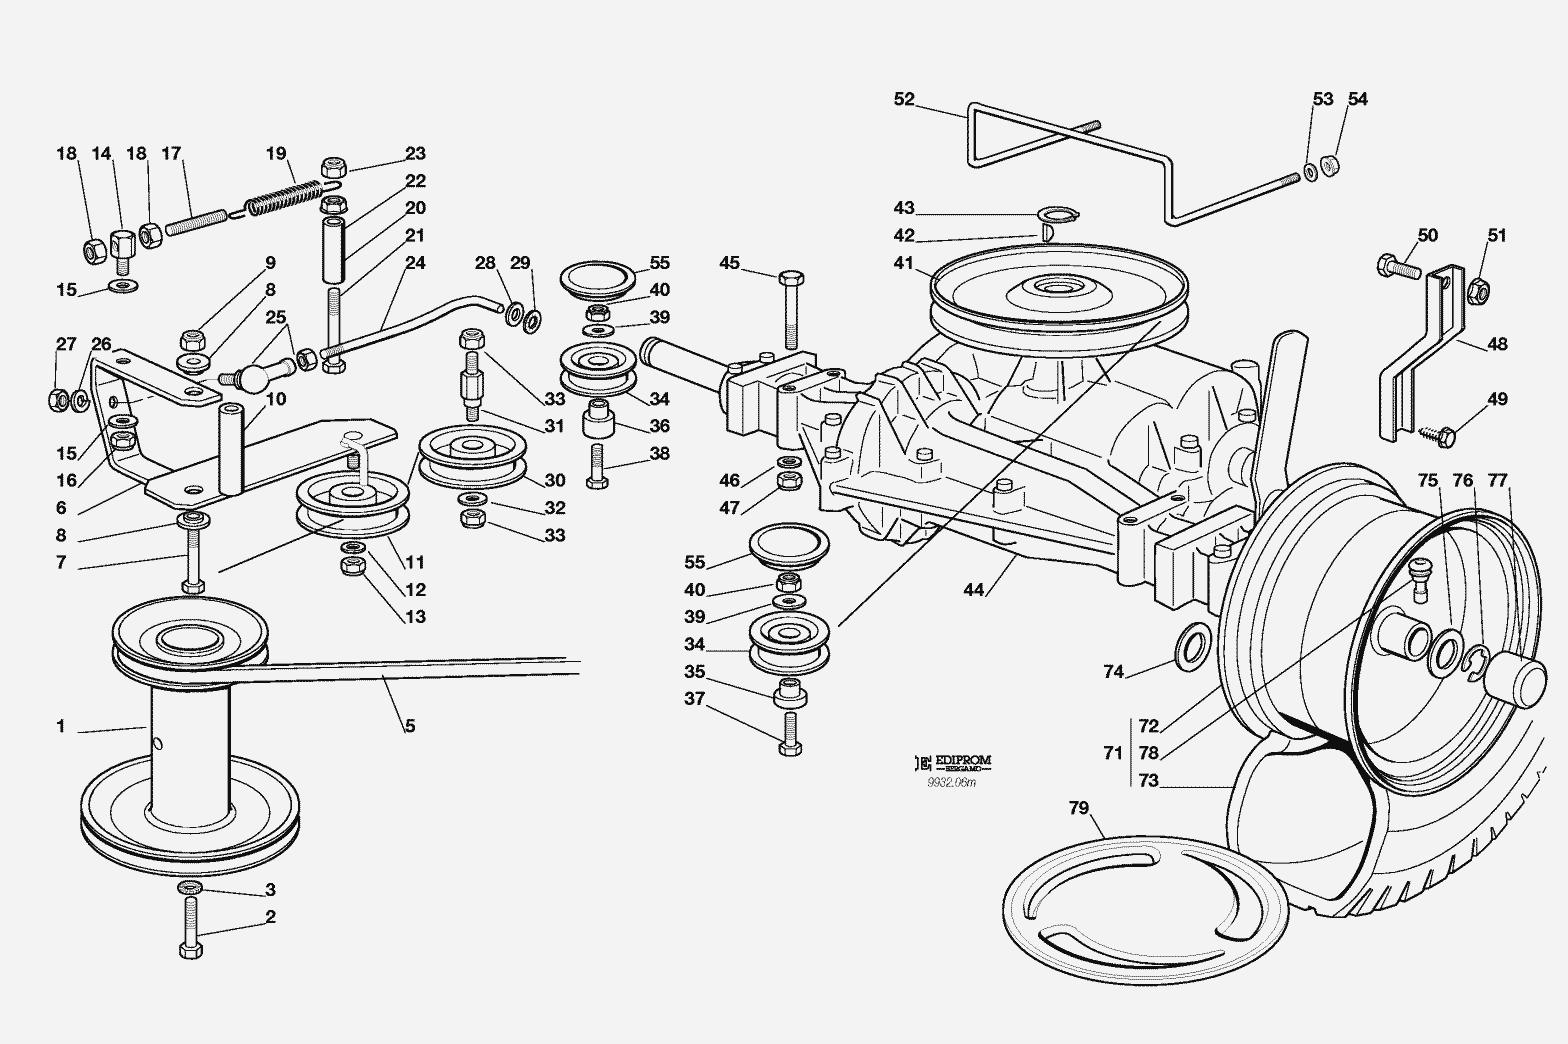 John Deere 100 Series Parts Diagram together with QK3v 9483 additionally Hydraulic Diagram John Deere 310 B Backhoe as well Wiring Diagram For Craftsman Walk Behind Mower as well 250 Jd Skid Steer Wiring. on john deere garden tractors sale